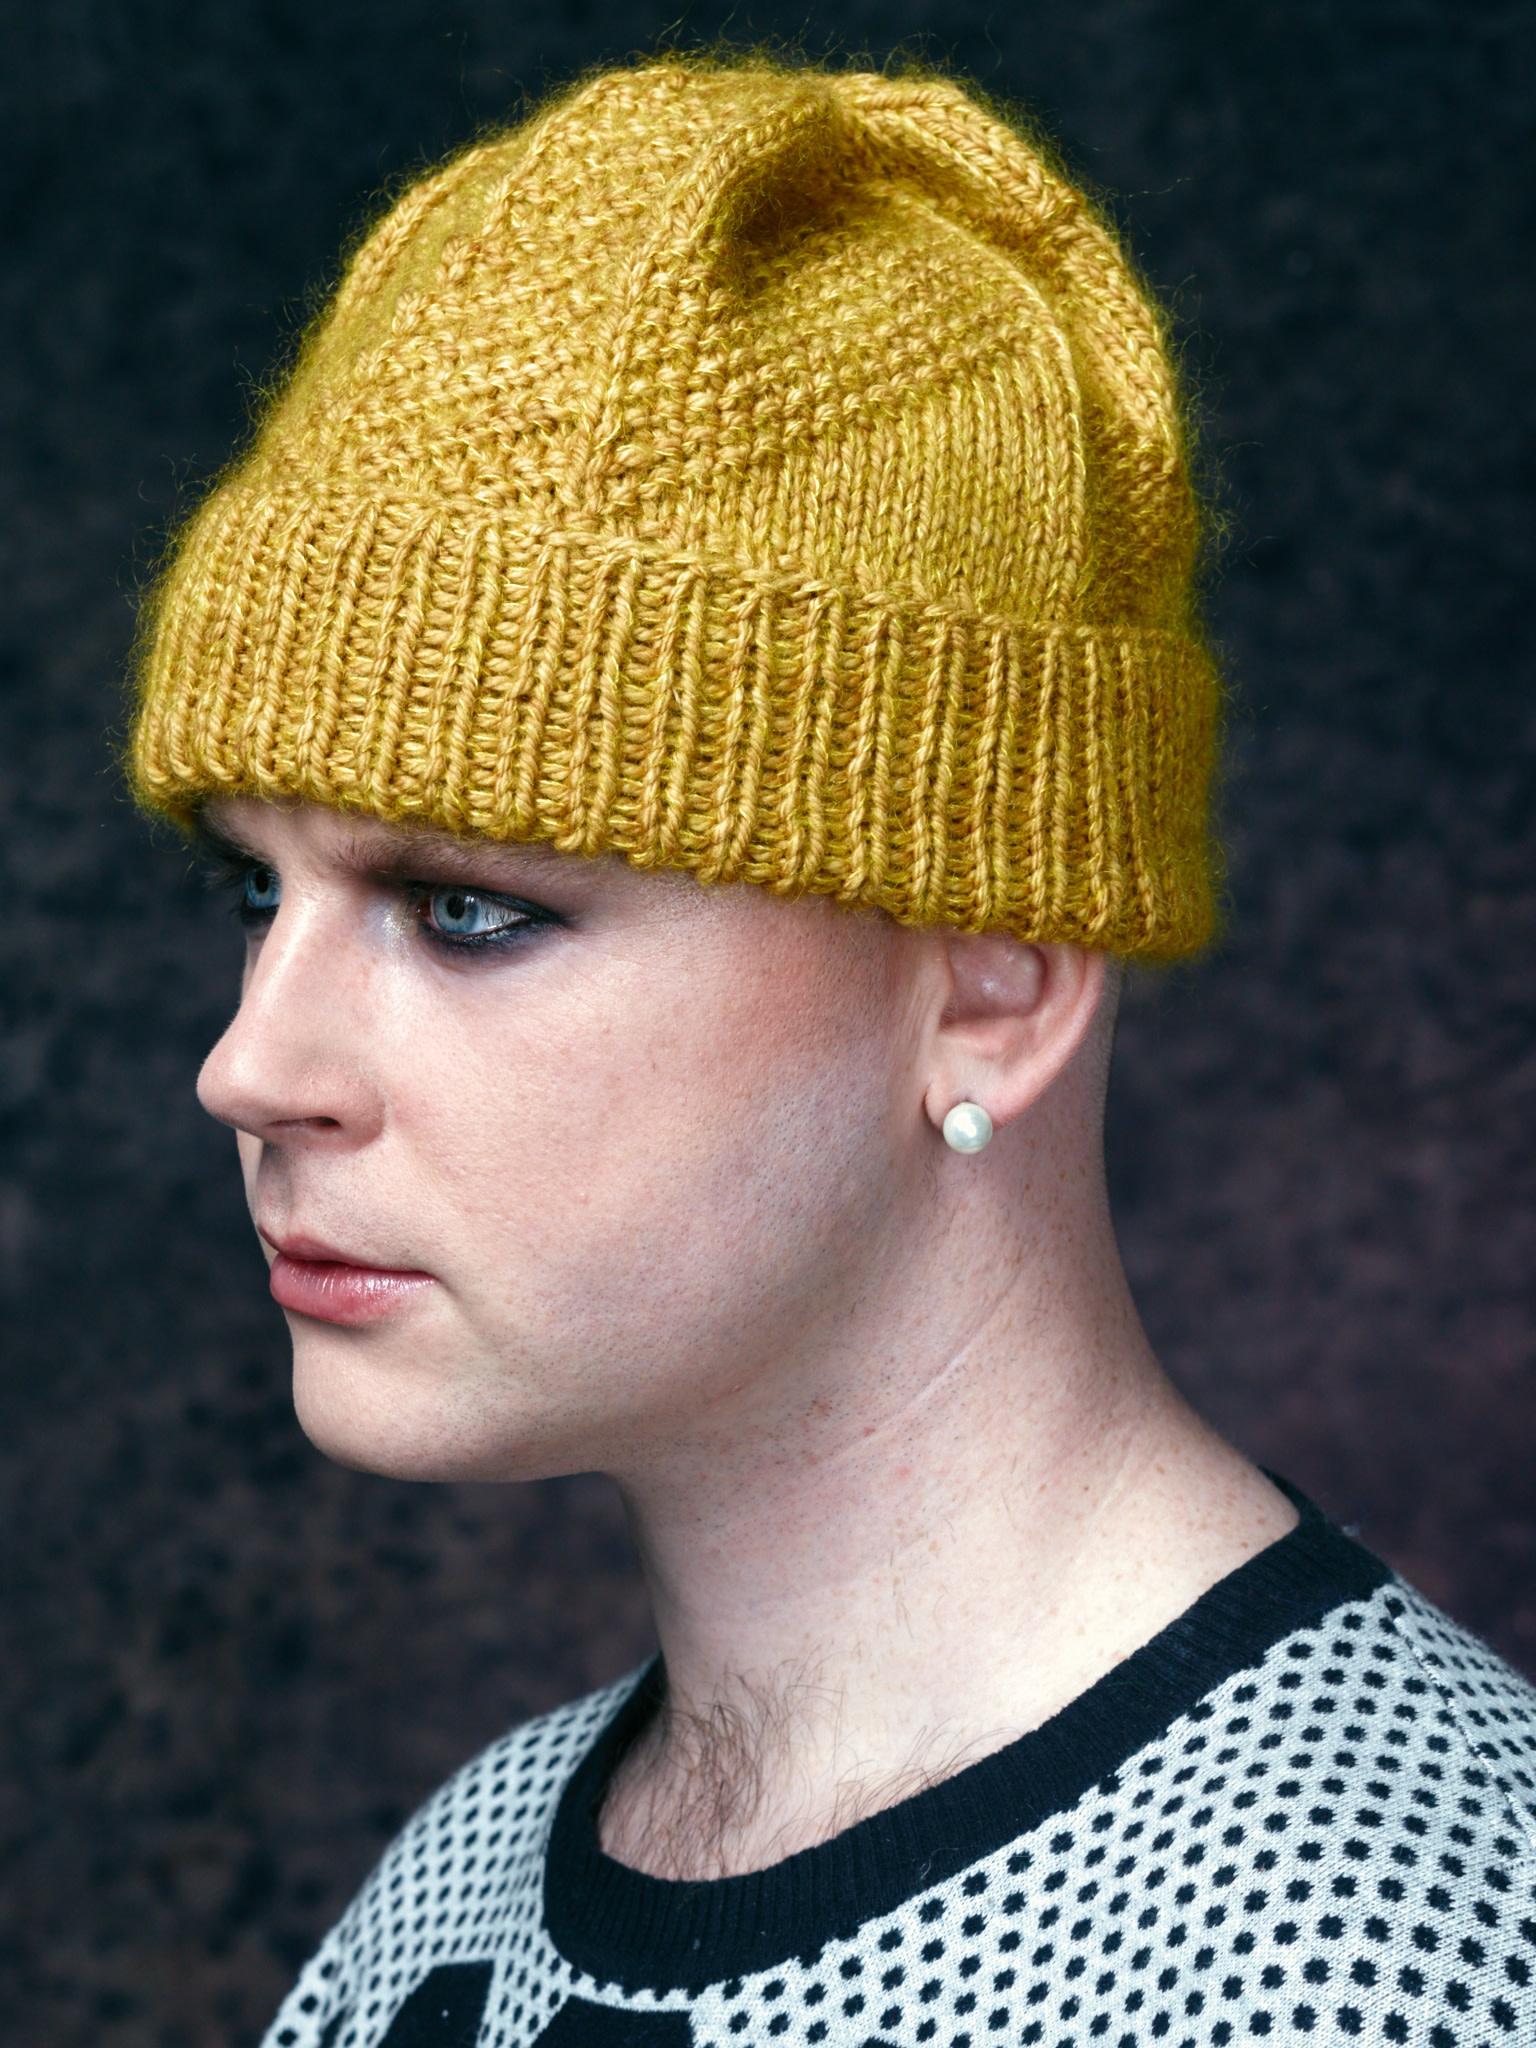 Westknits WK HIBERKNITTING HAT - KIT AUBERGINE